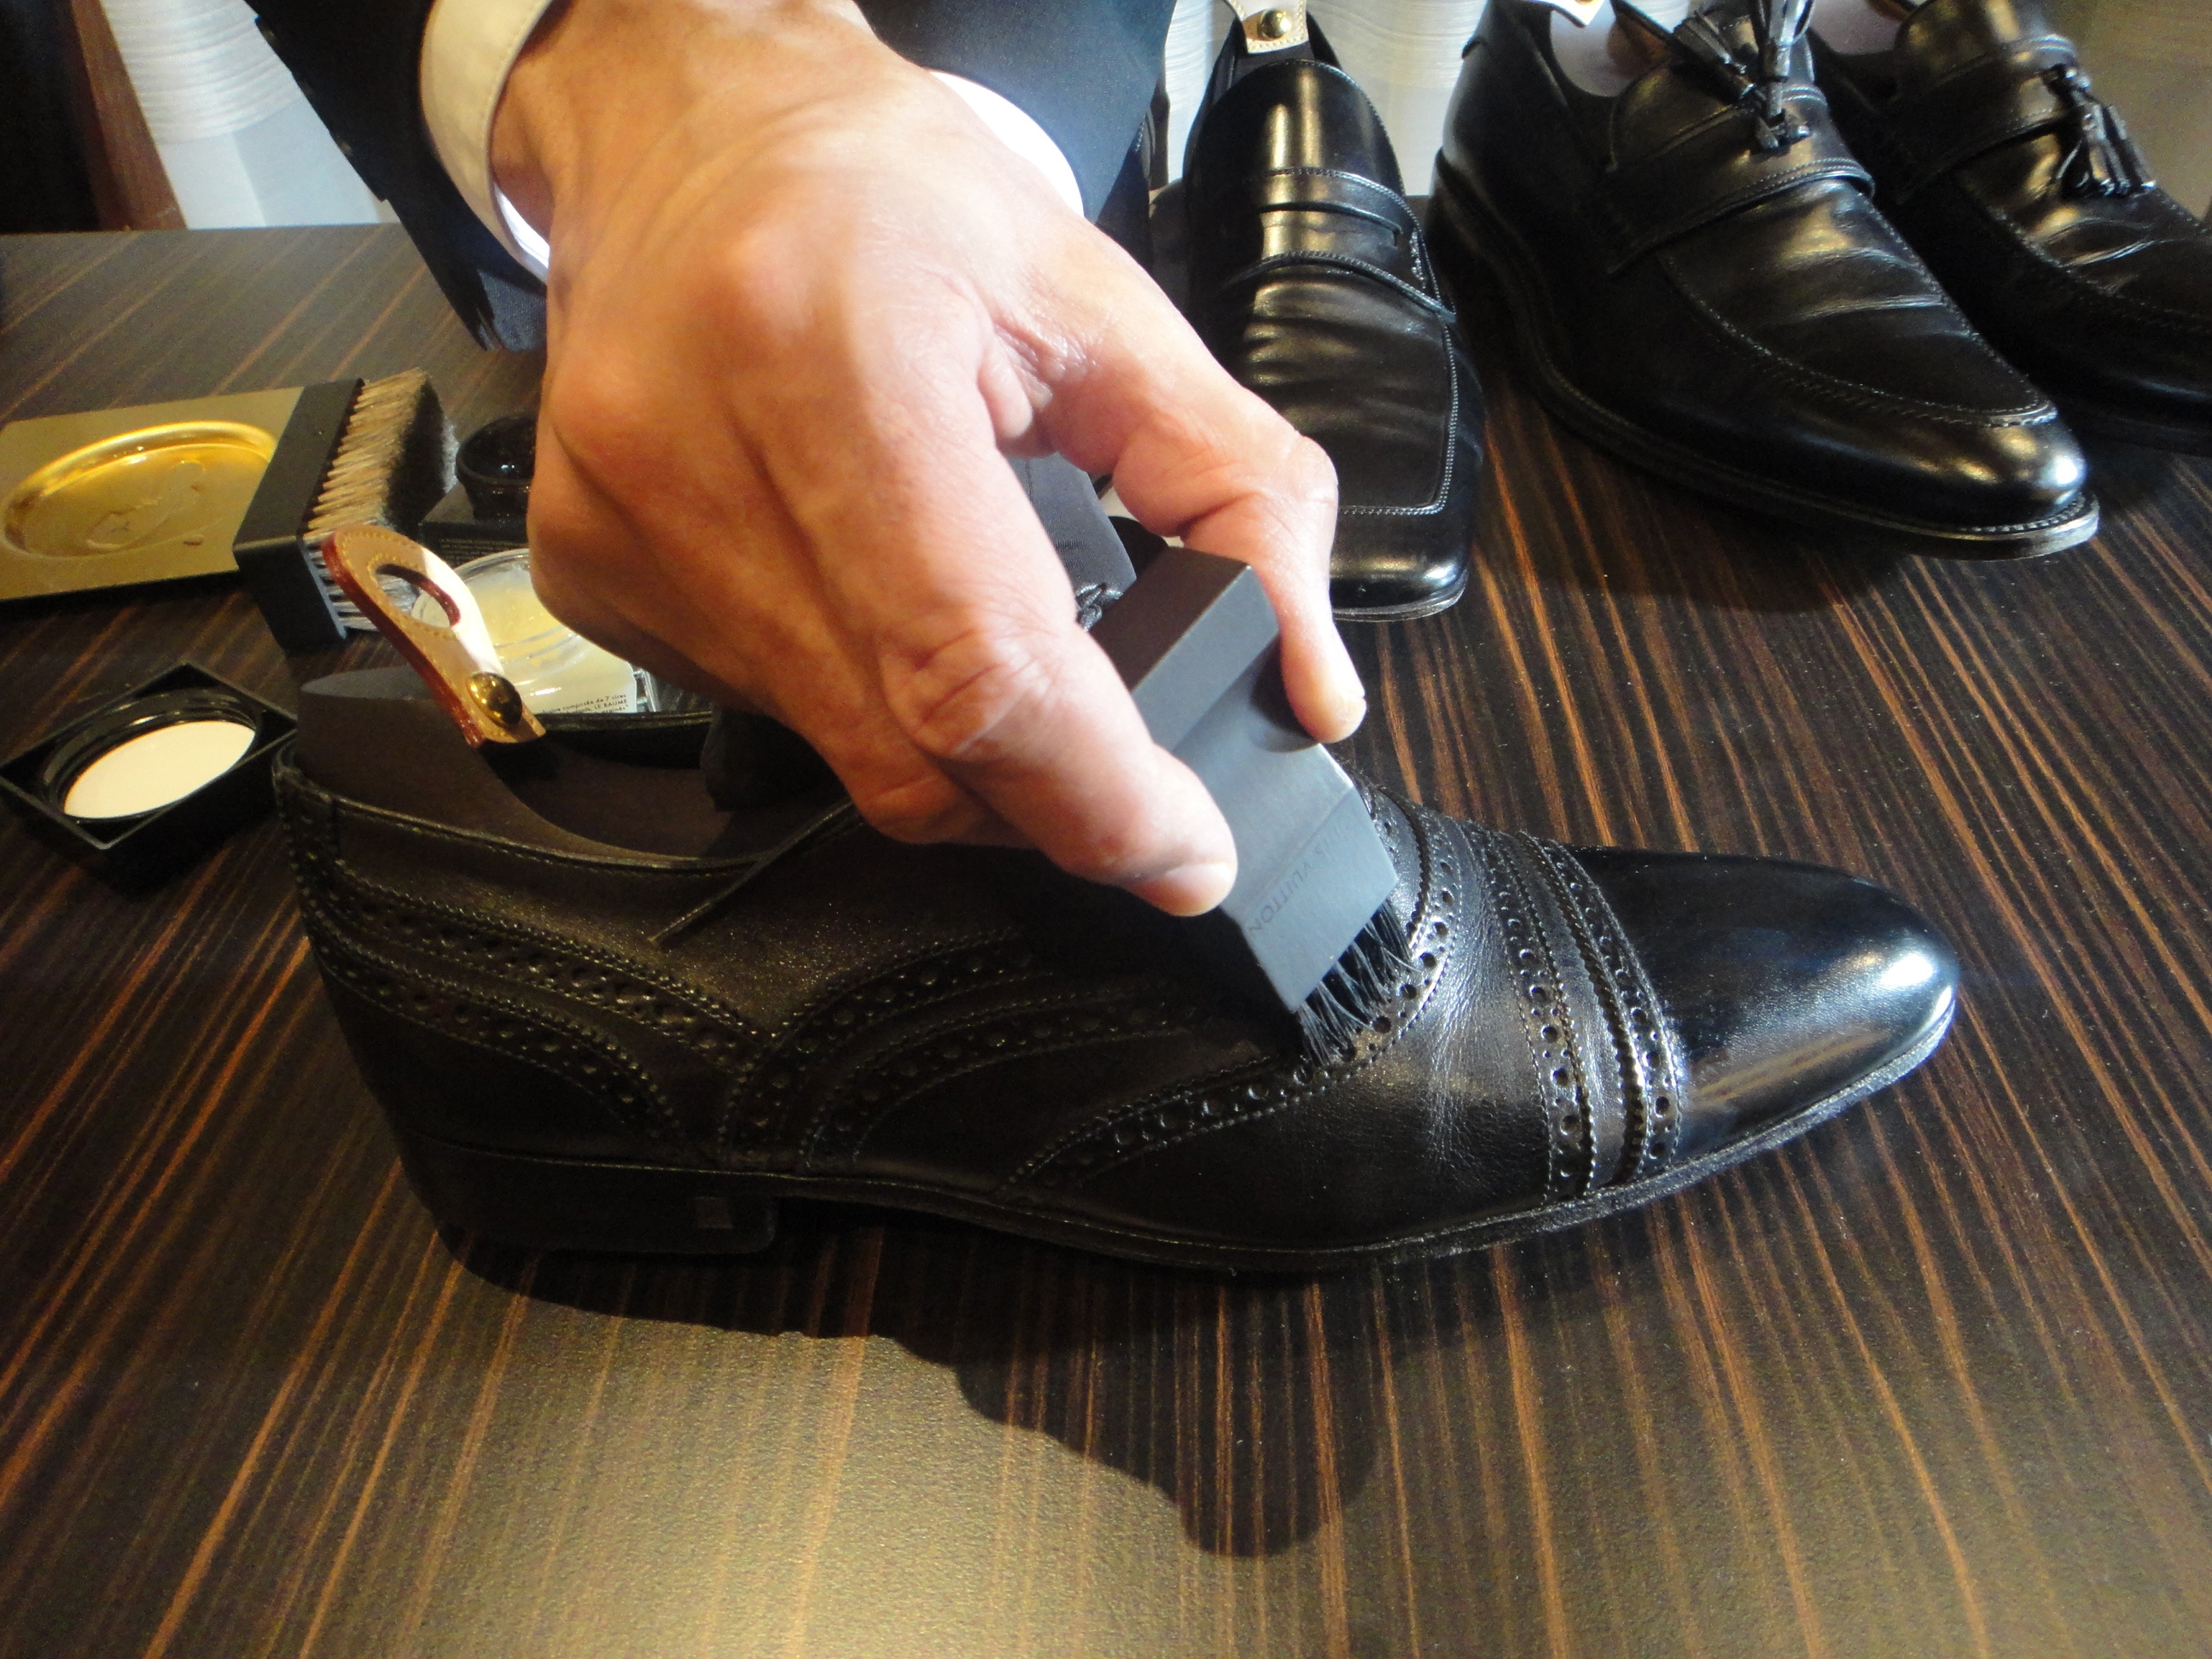 Shoe shine specialista - Schuhputz Spezialisten